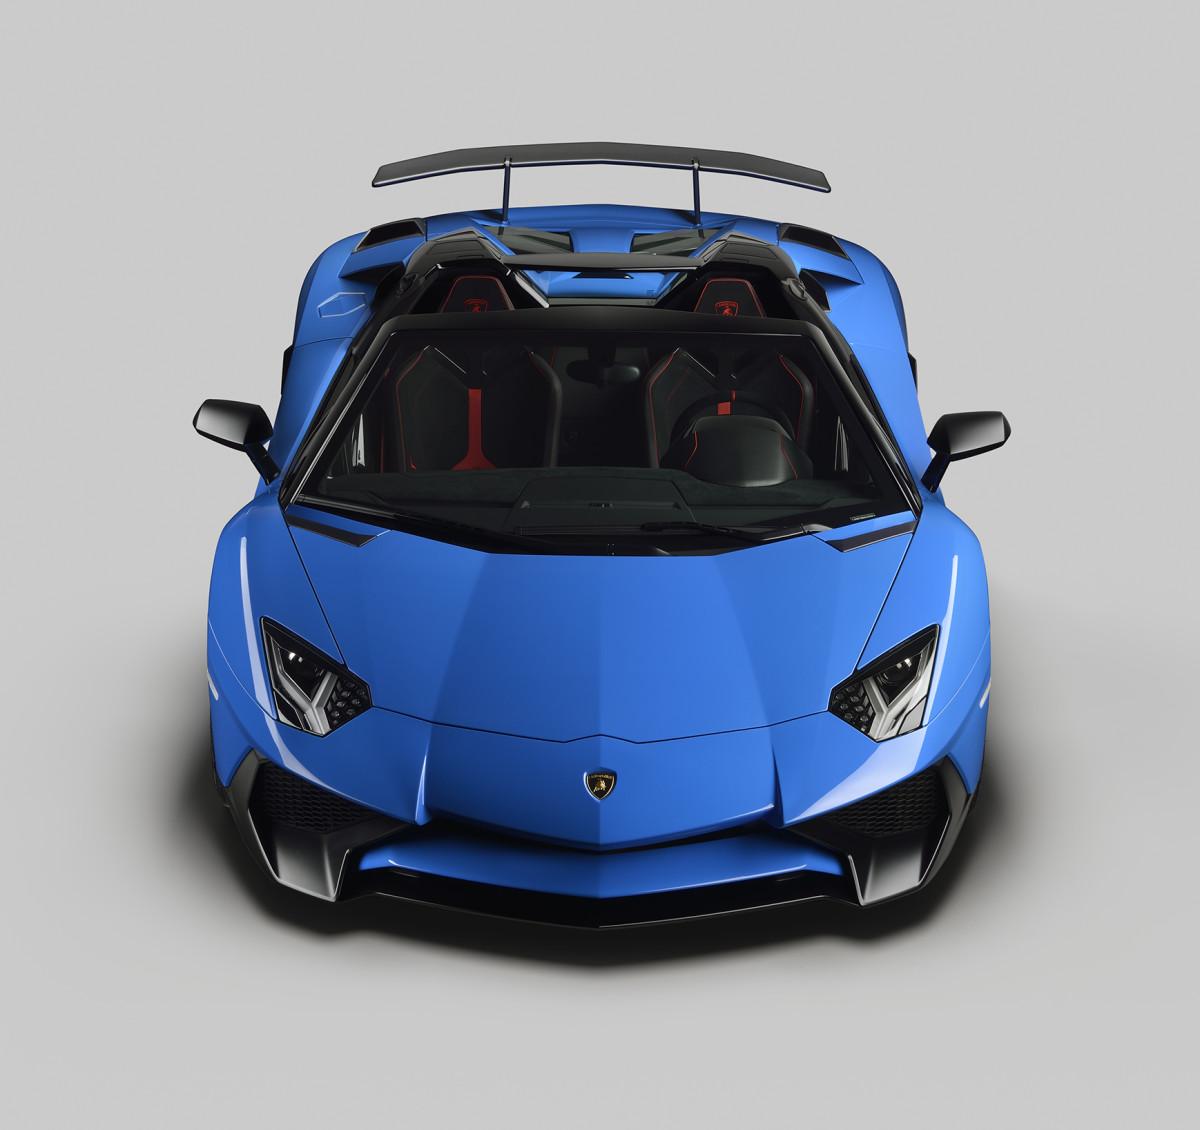 Photo: Lamborghini